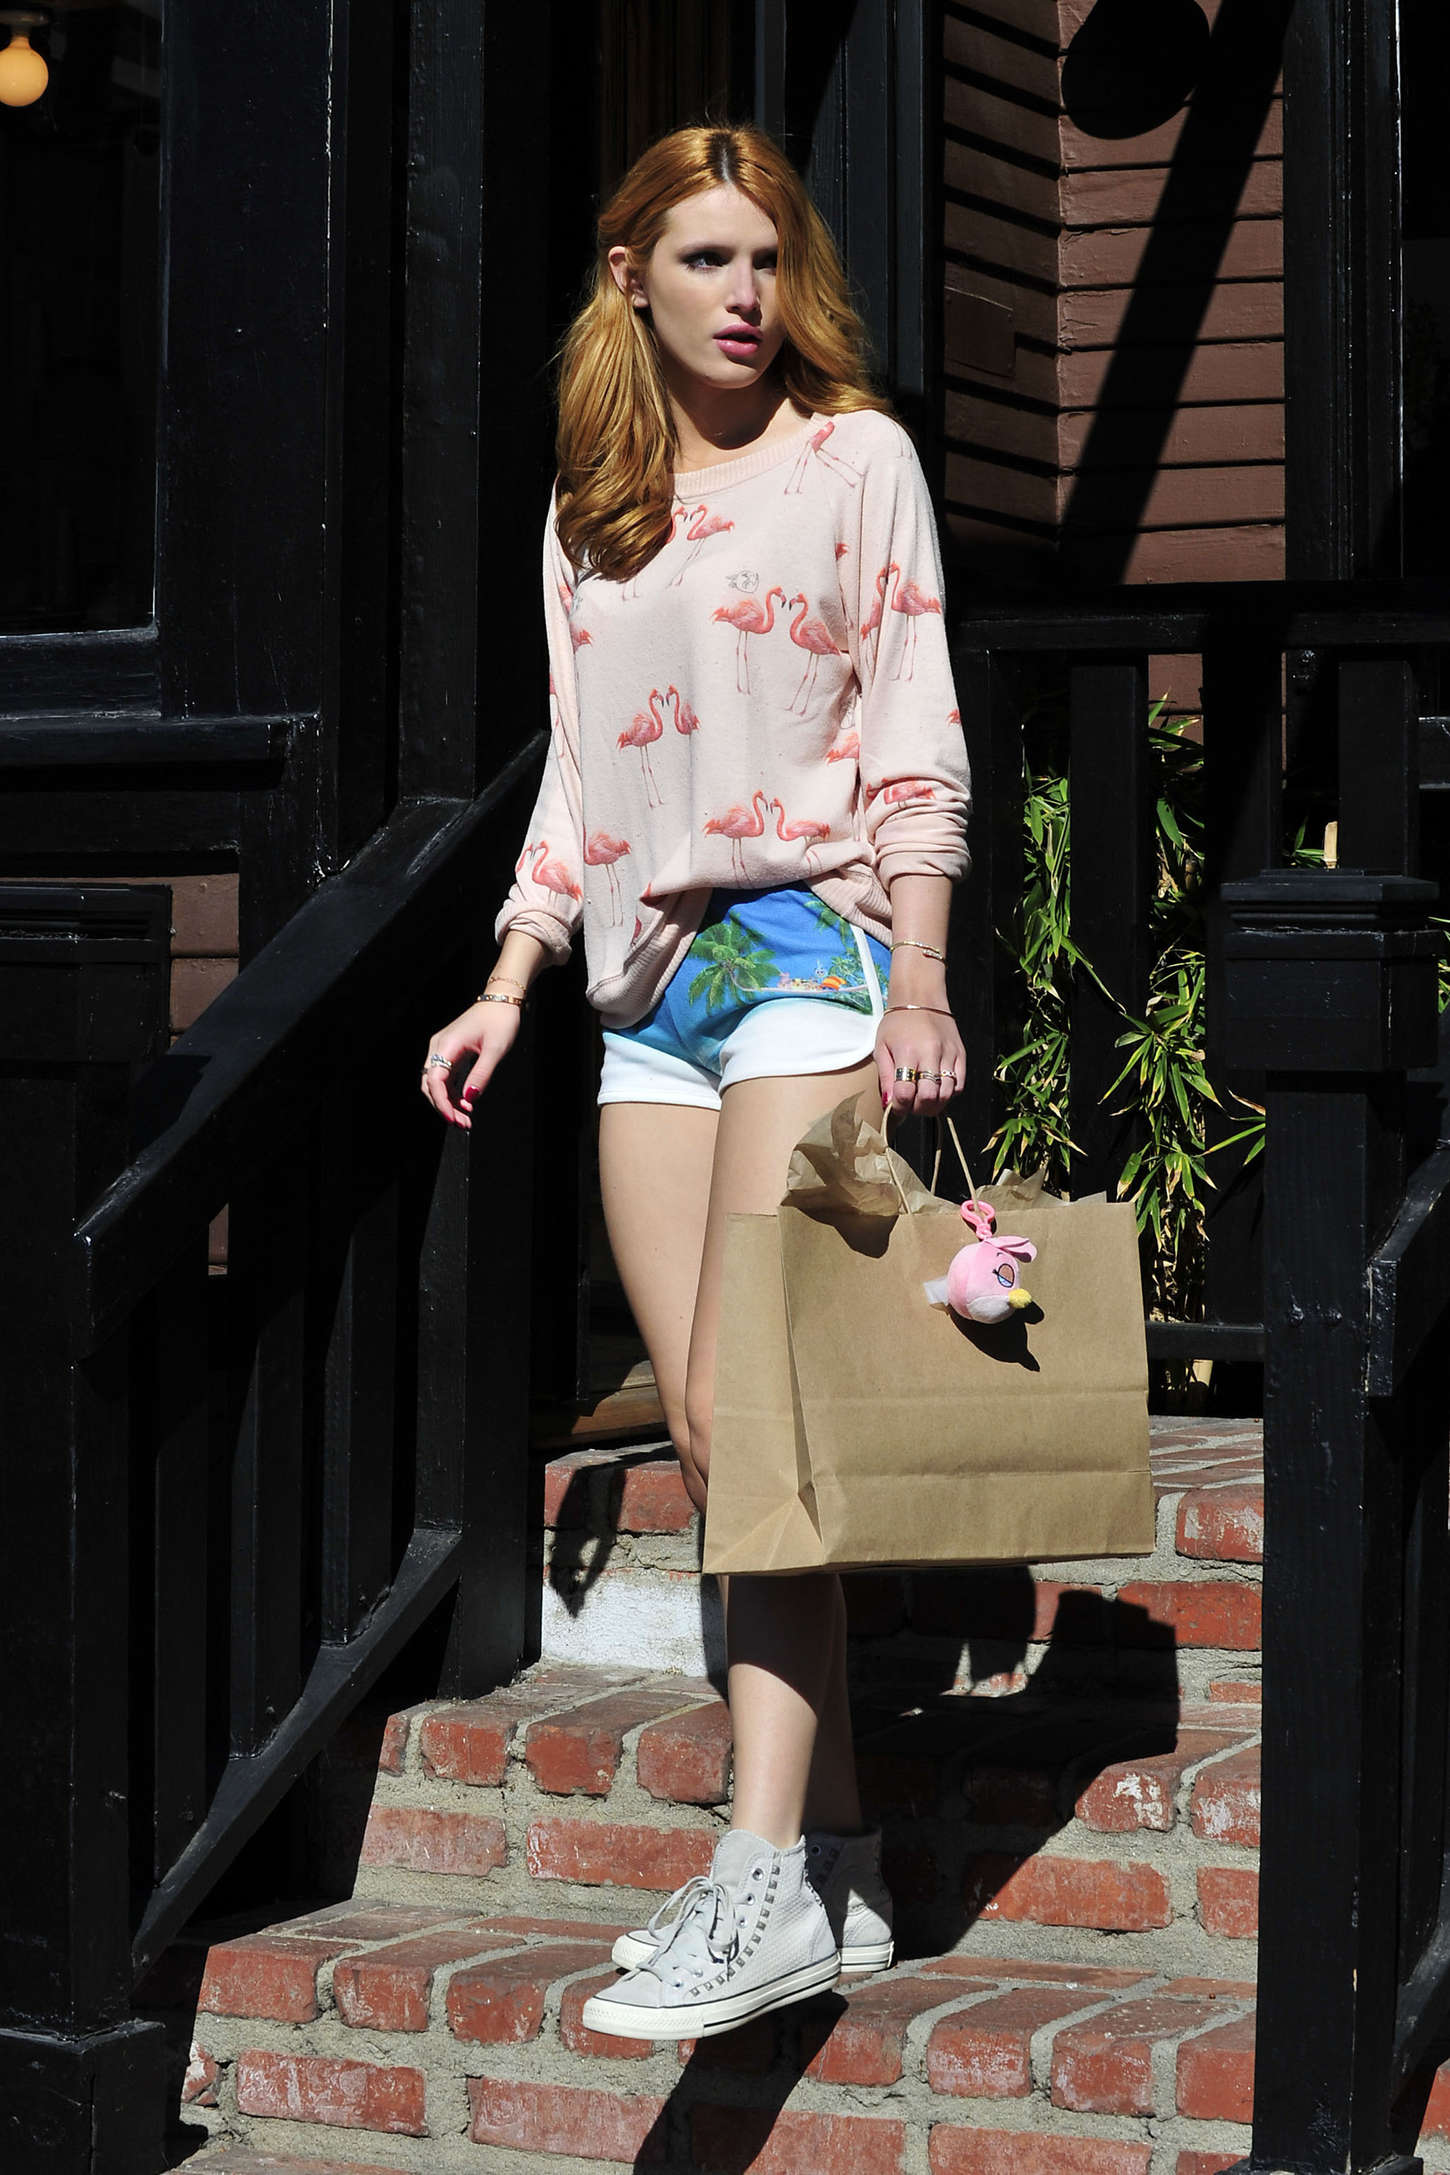 Bella Thorne 2014 : Bella Thorne: Michael Simon Photoshoot 2014 -48